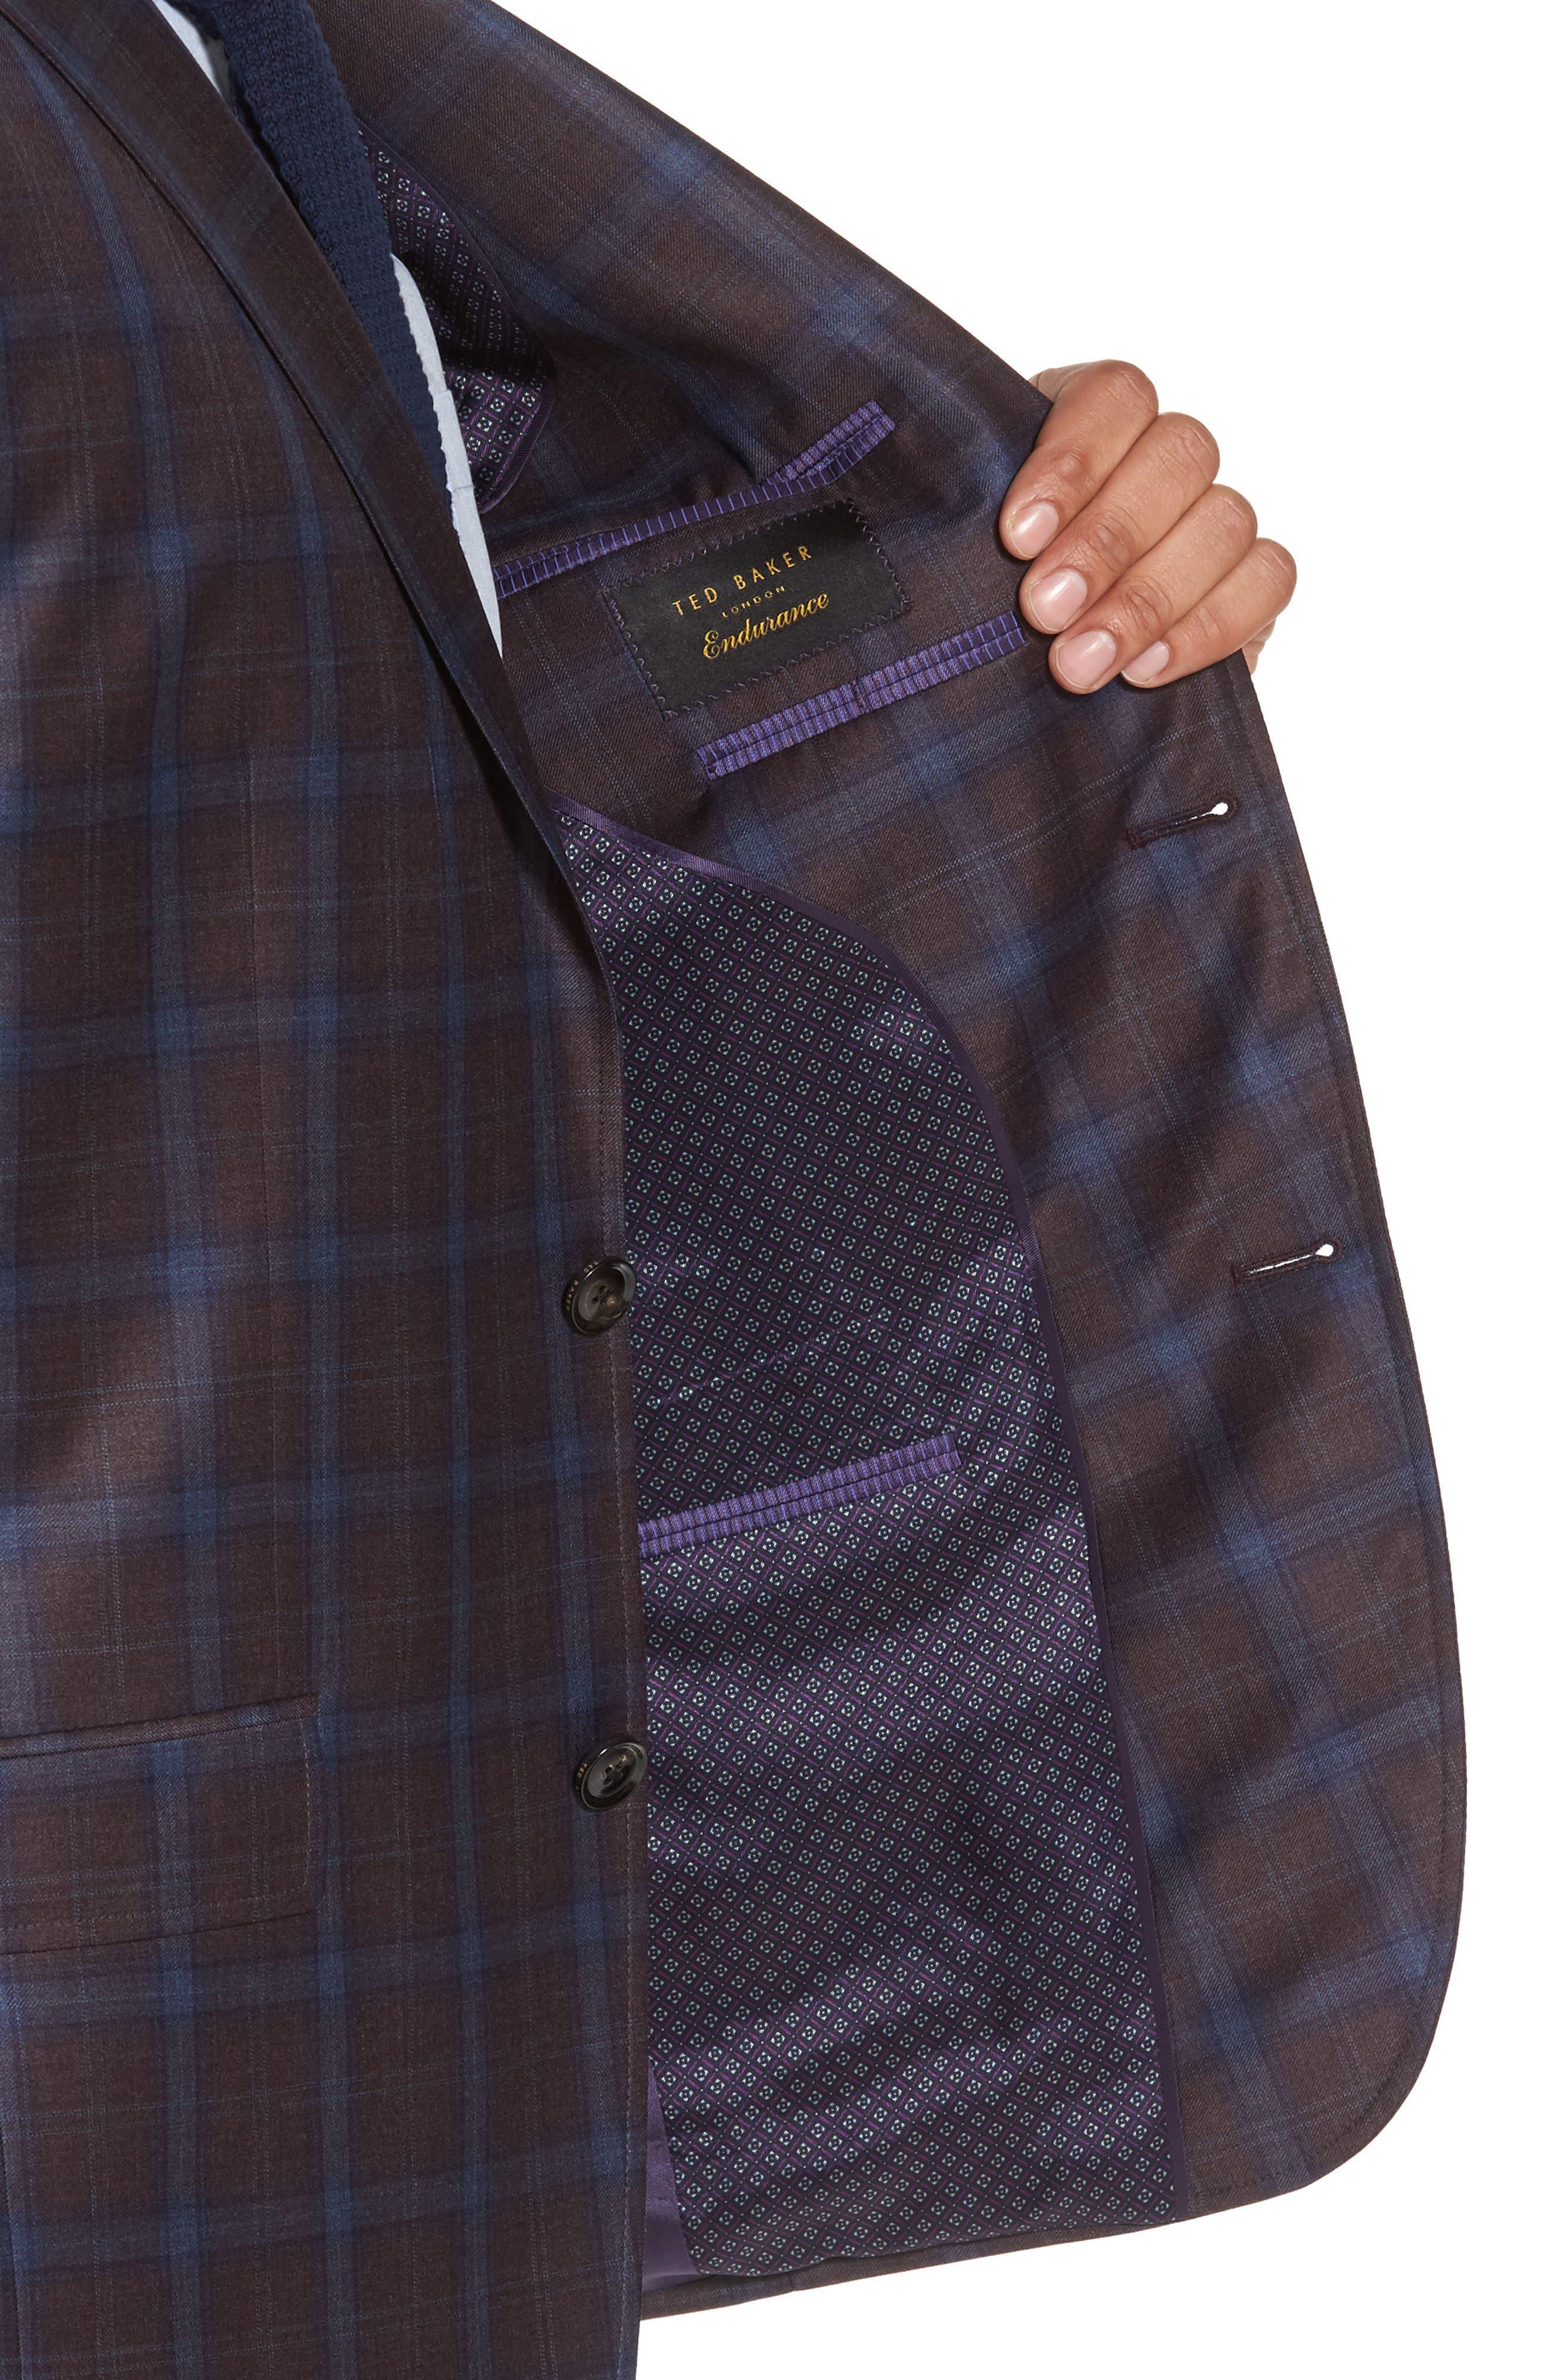 Jay Trim Fit Plaid Wool Sport Coat,                             Alternate thumbnail 4, color,                             932